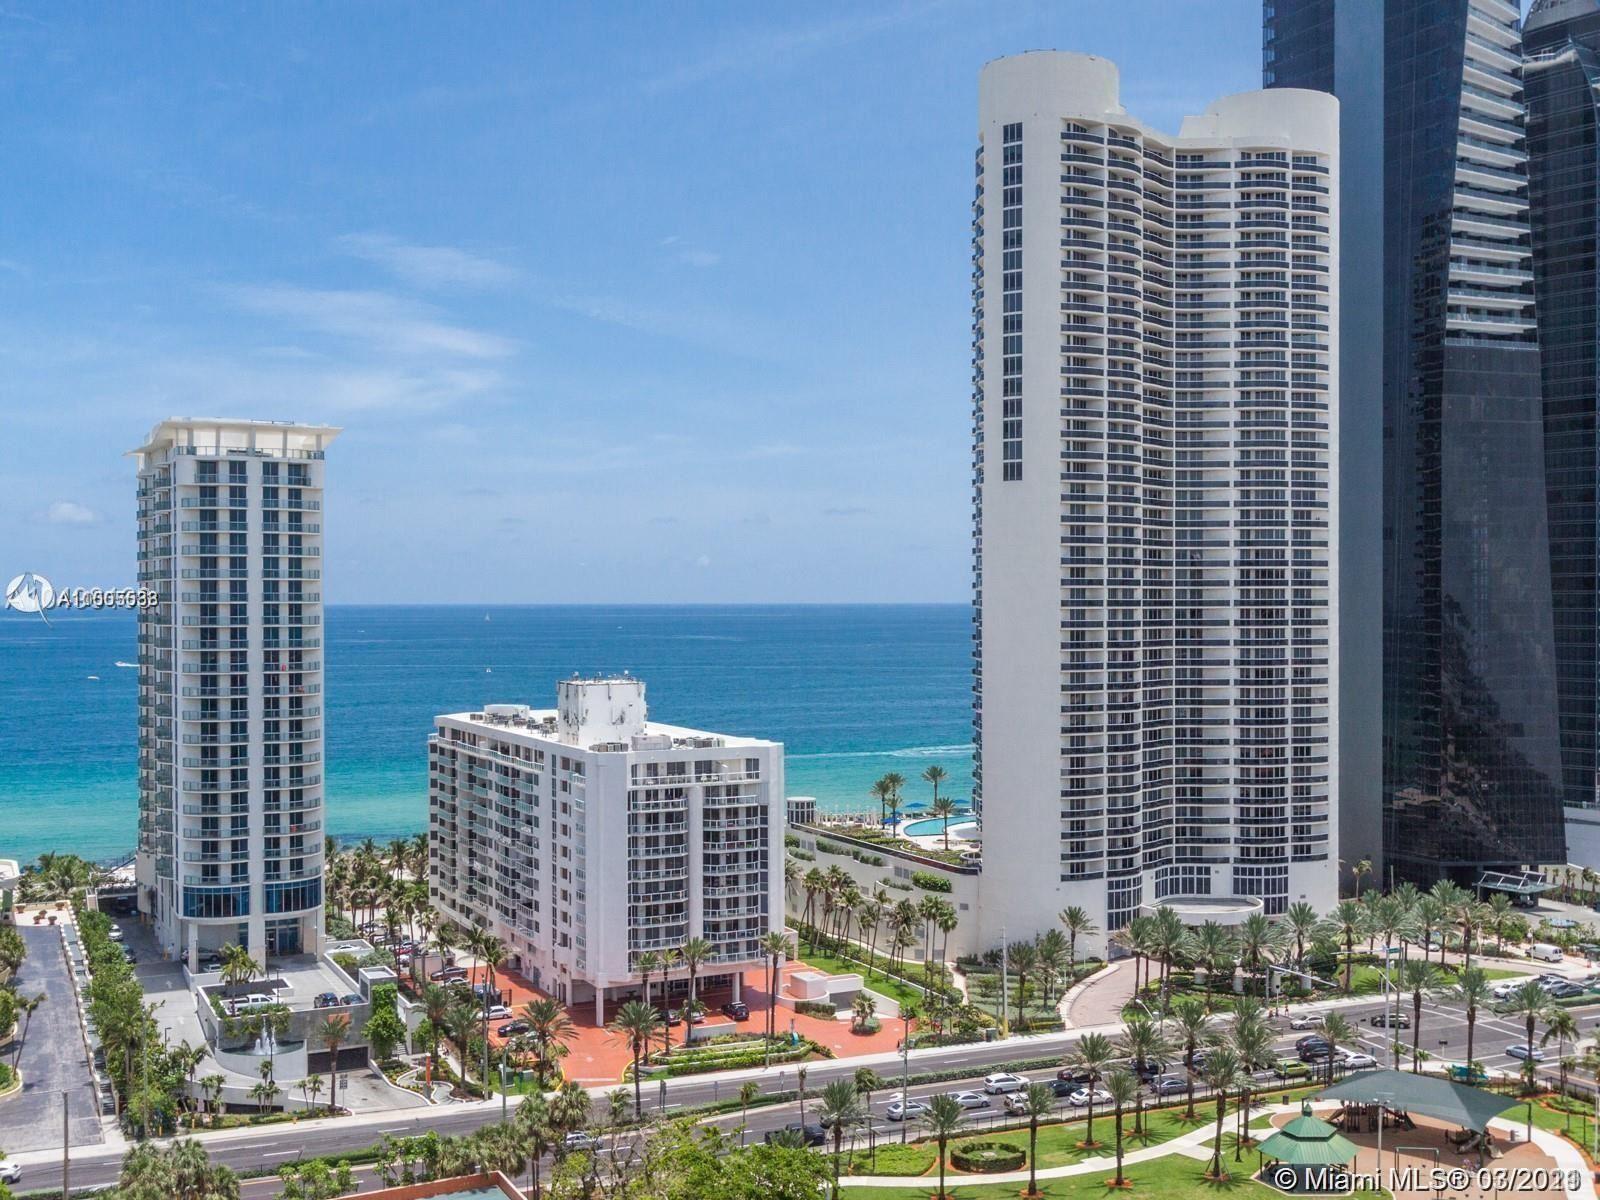 Photo of 210 174th St #2103, Sunny Isles Beach, FL 33160 (MLS # A11005538)